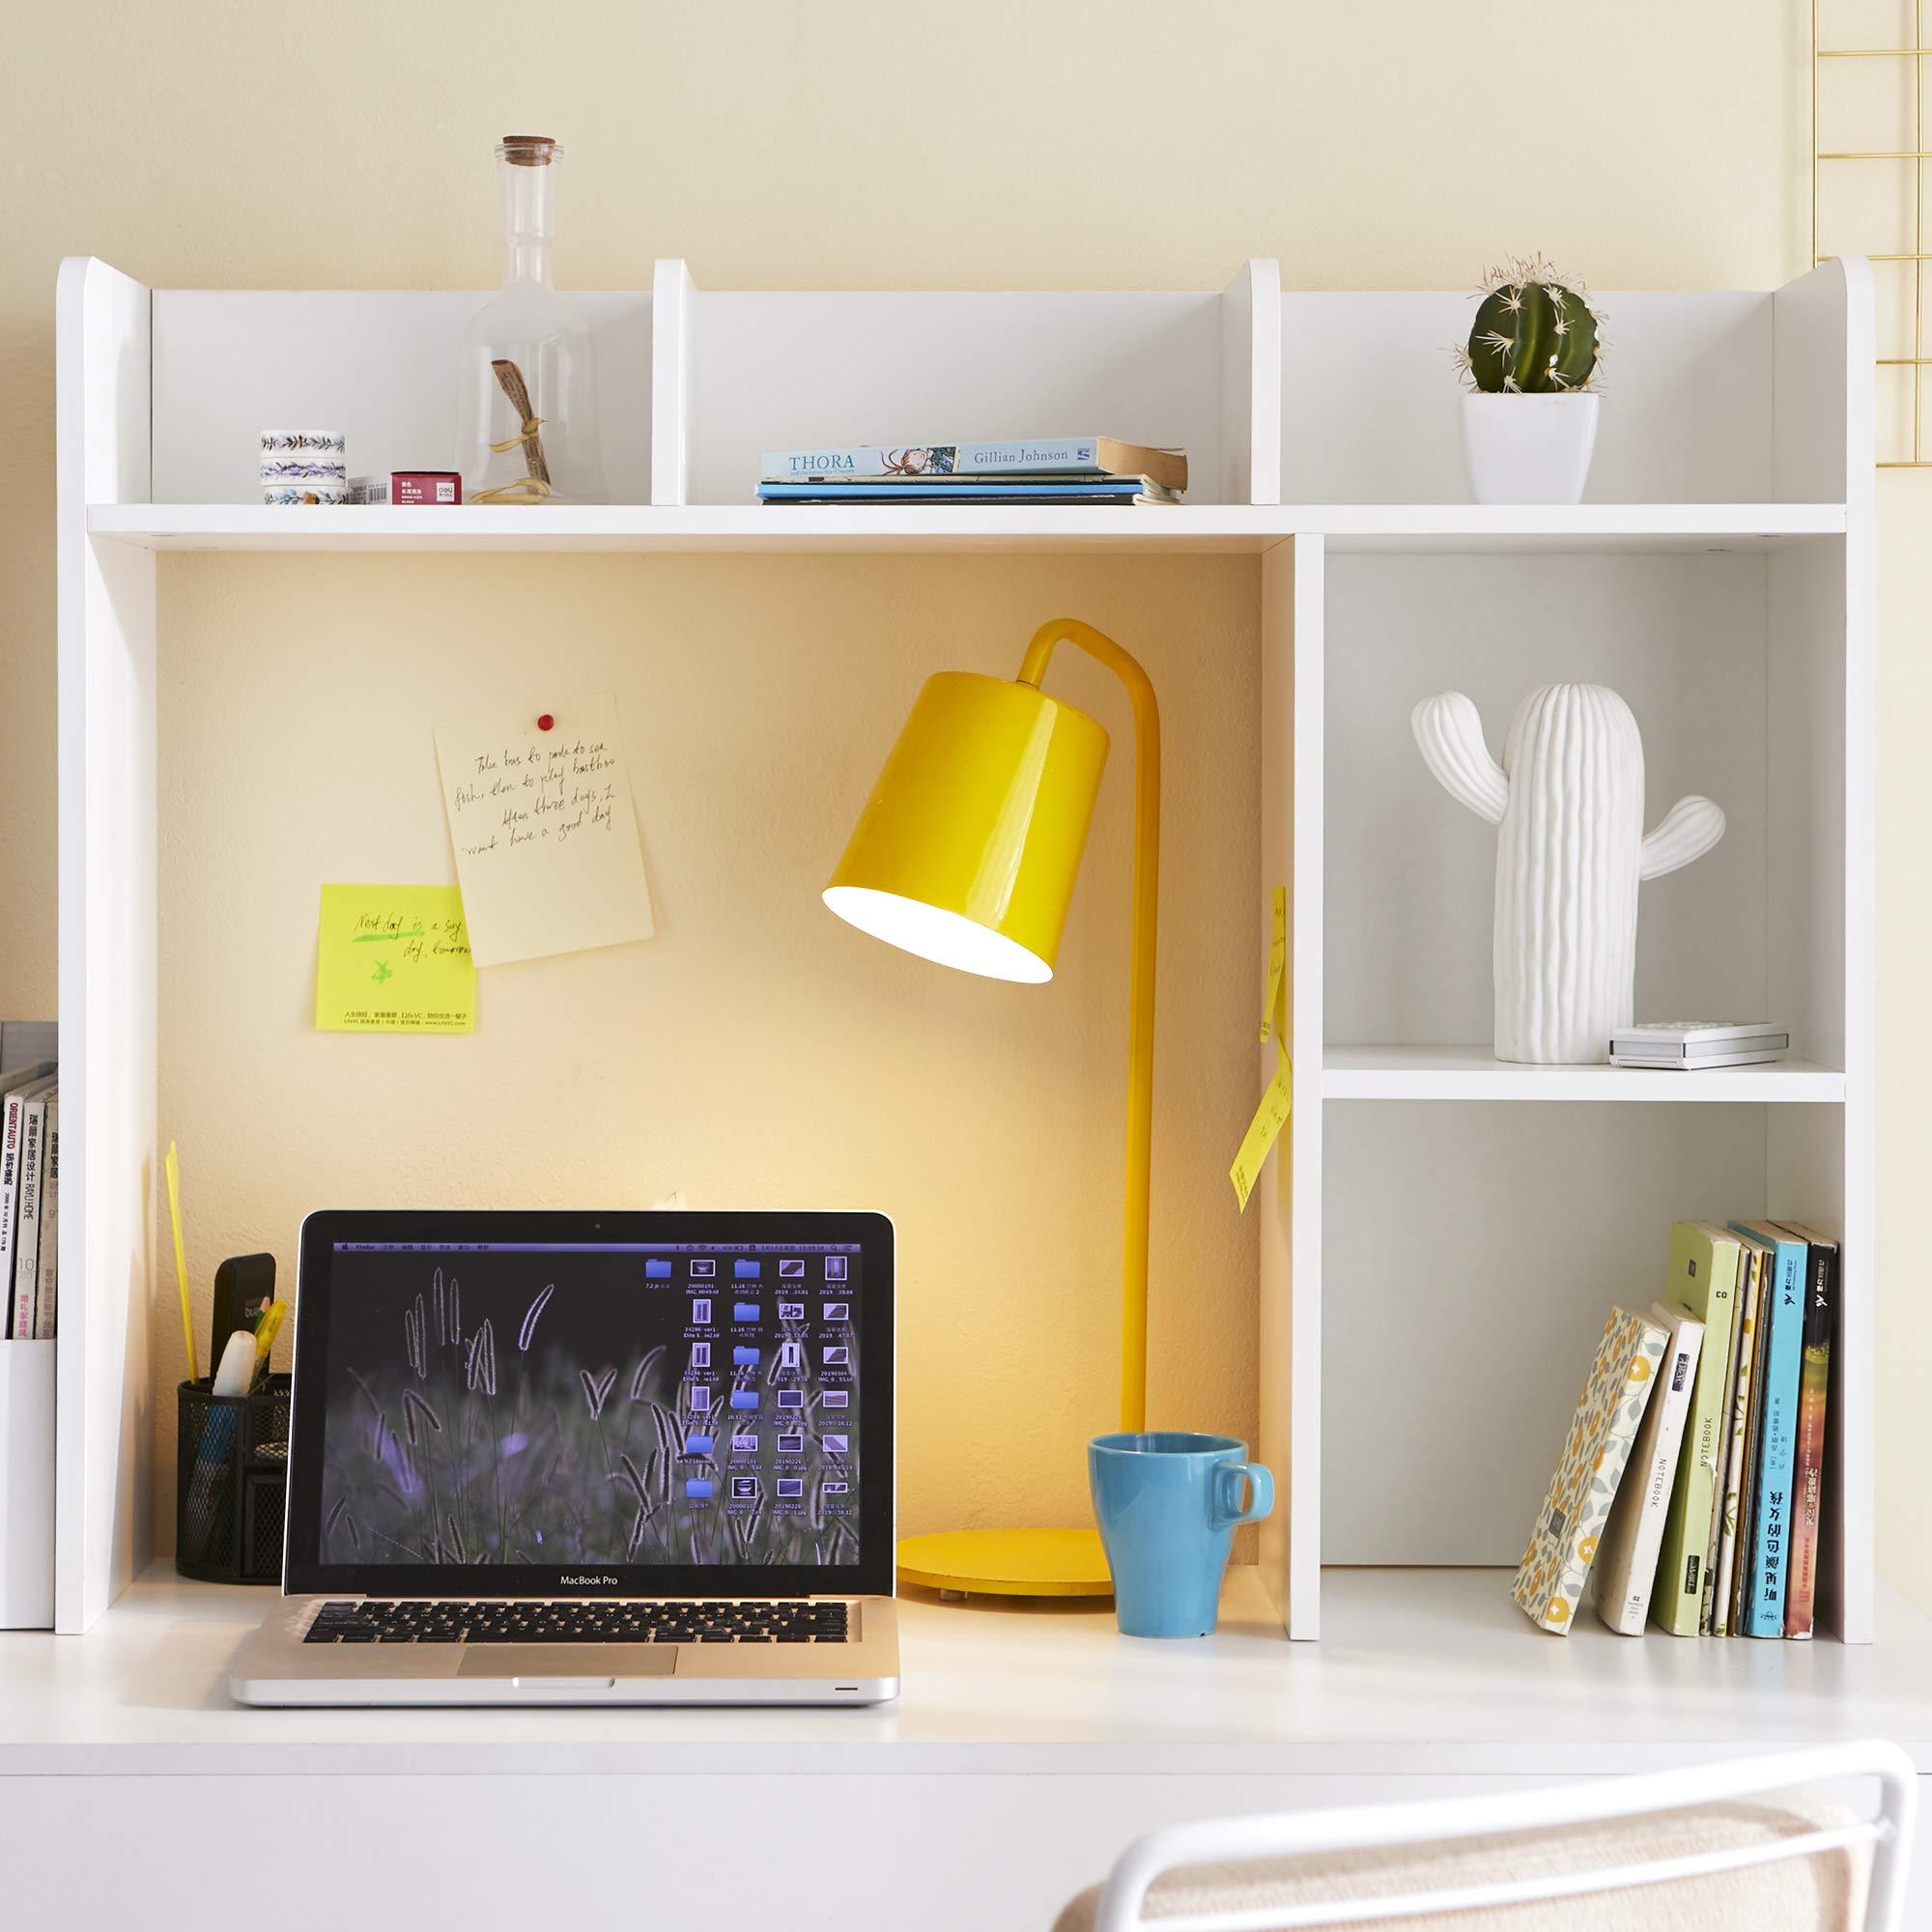 DormCo Classic Desk Bookshelf - White by DormCo (Image #2)